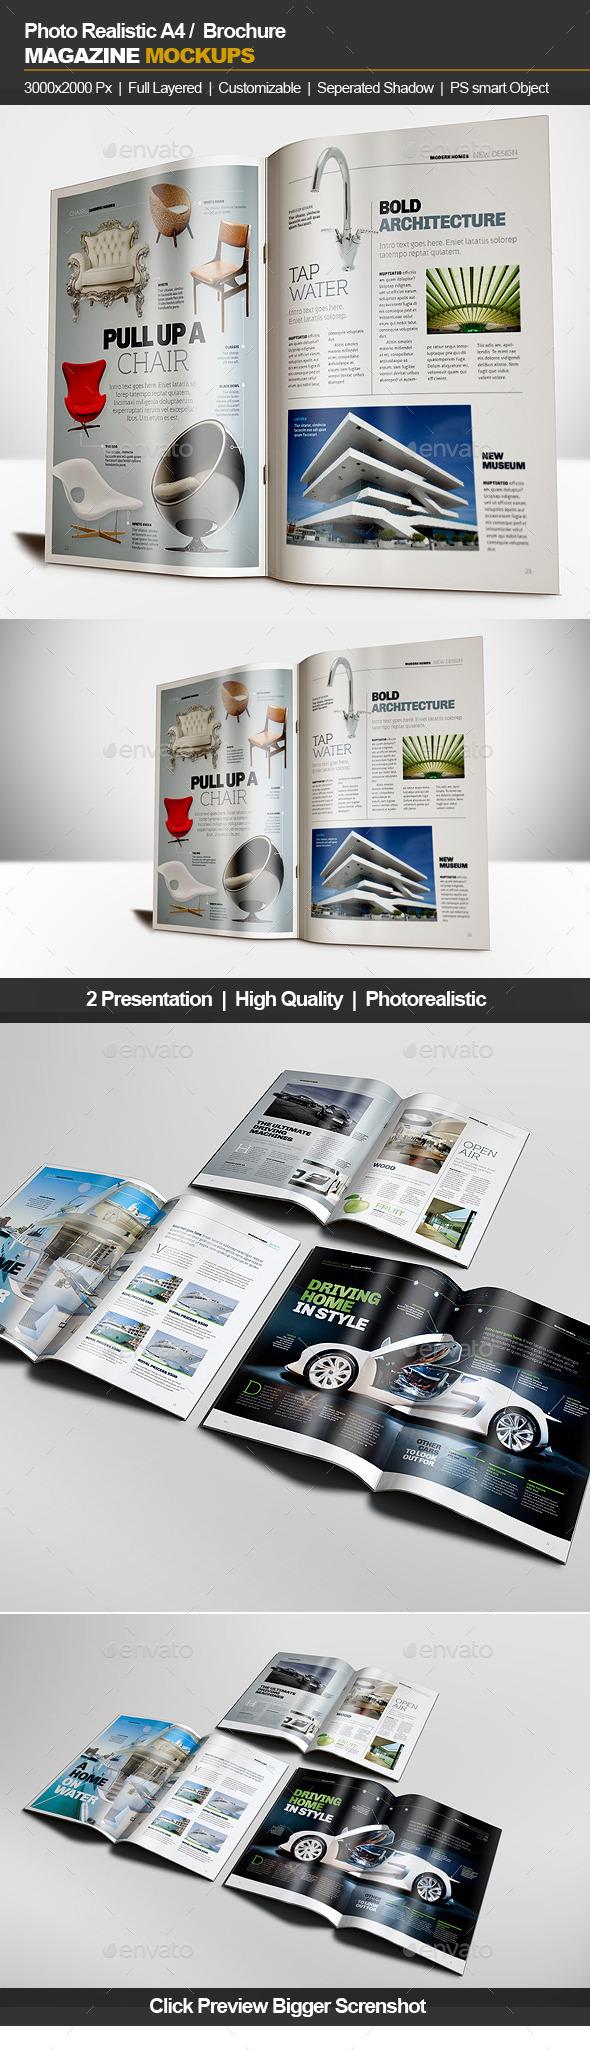 GraphicRiver A4 Brochure Magazine Mockup 11862139